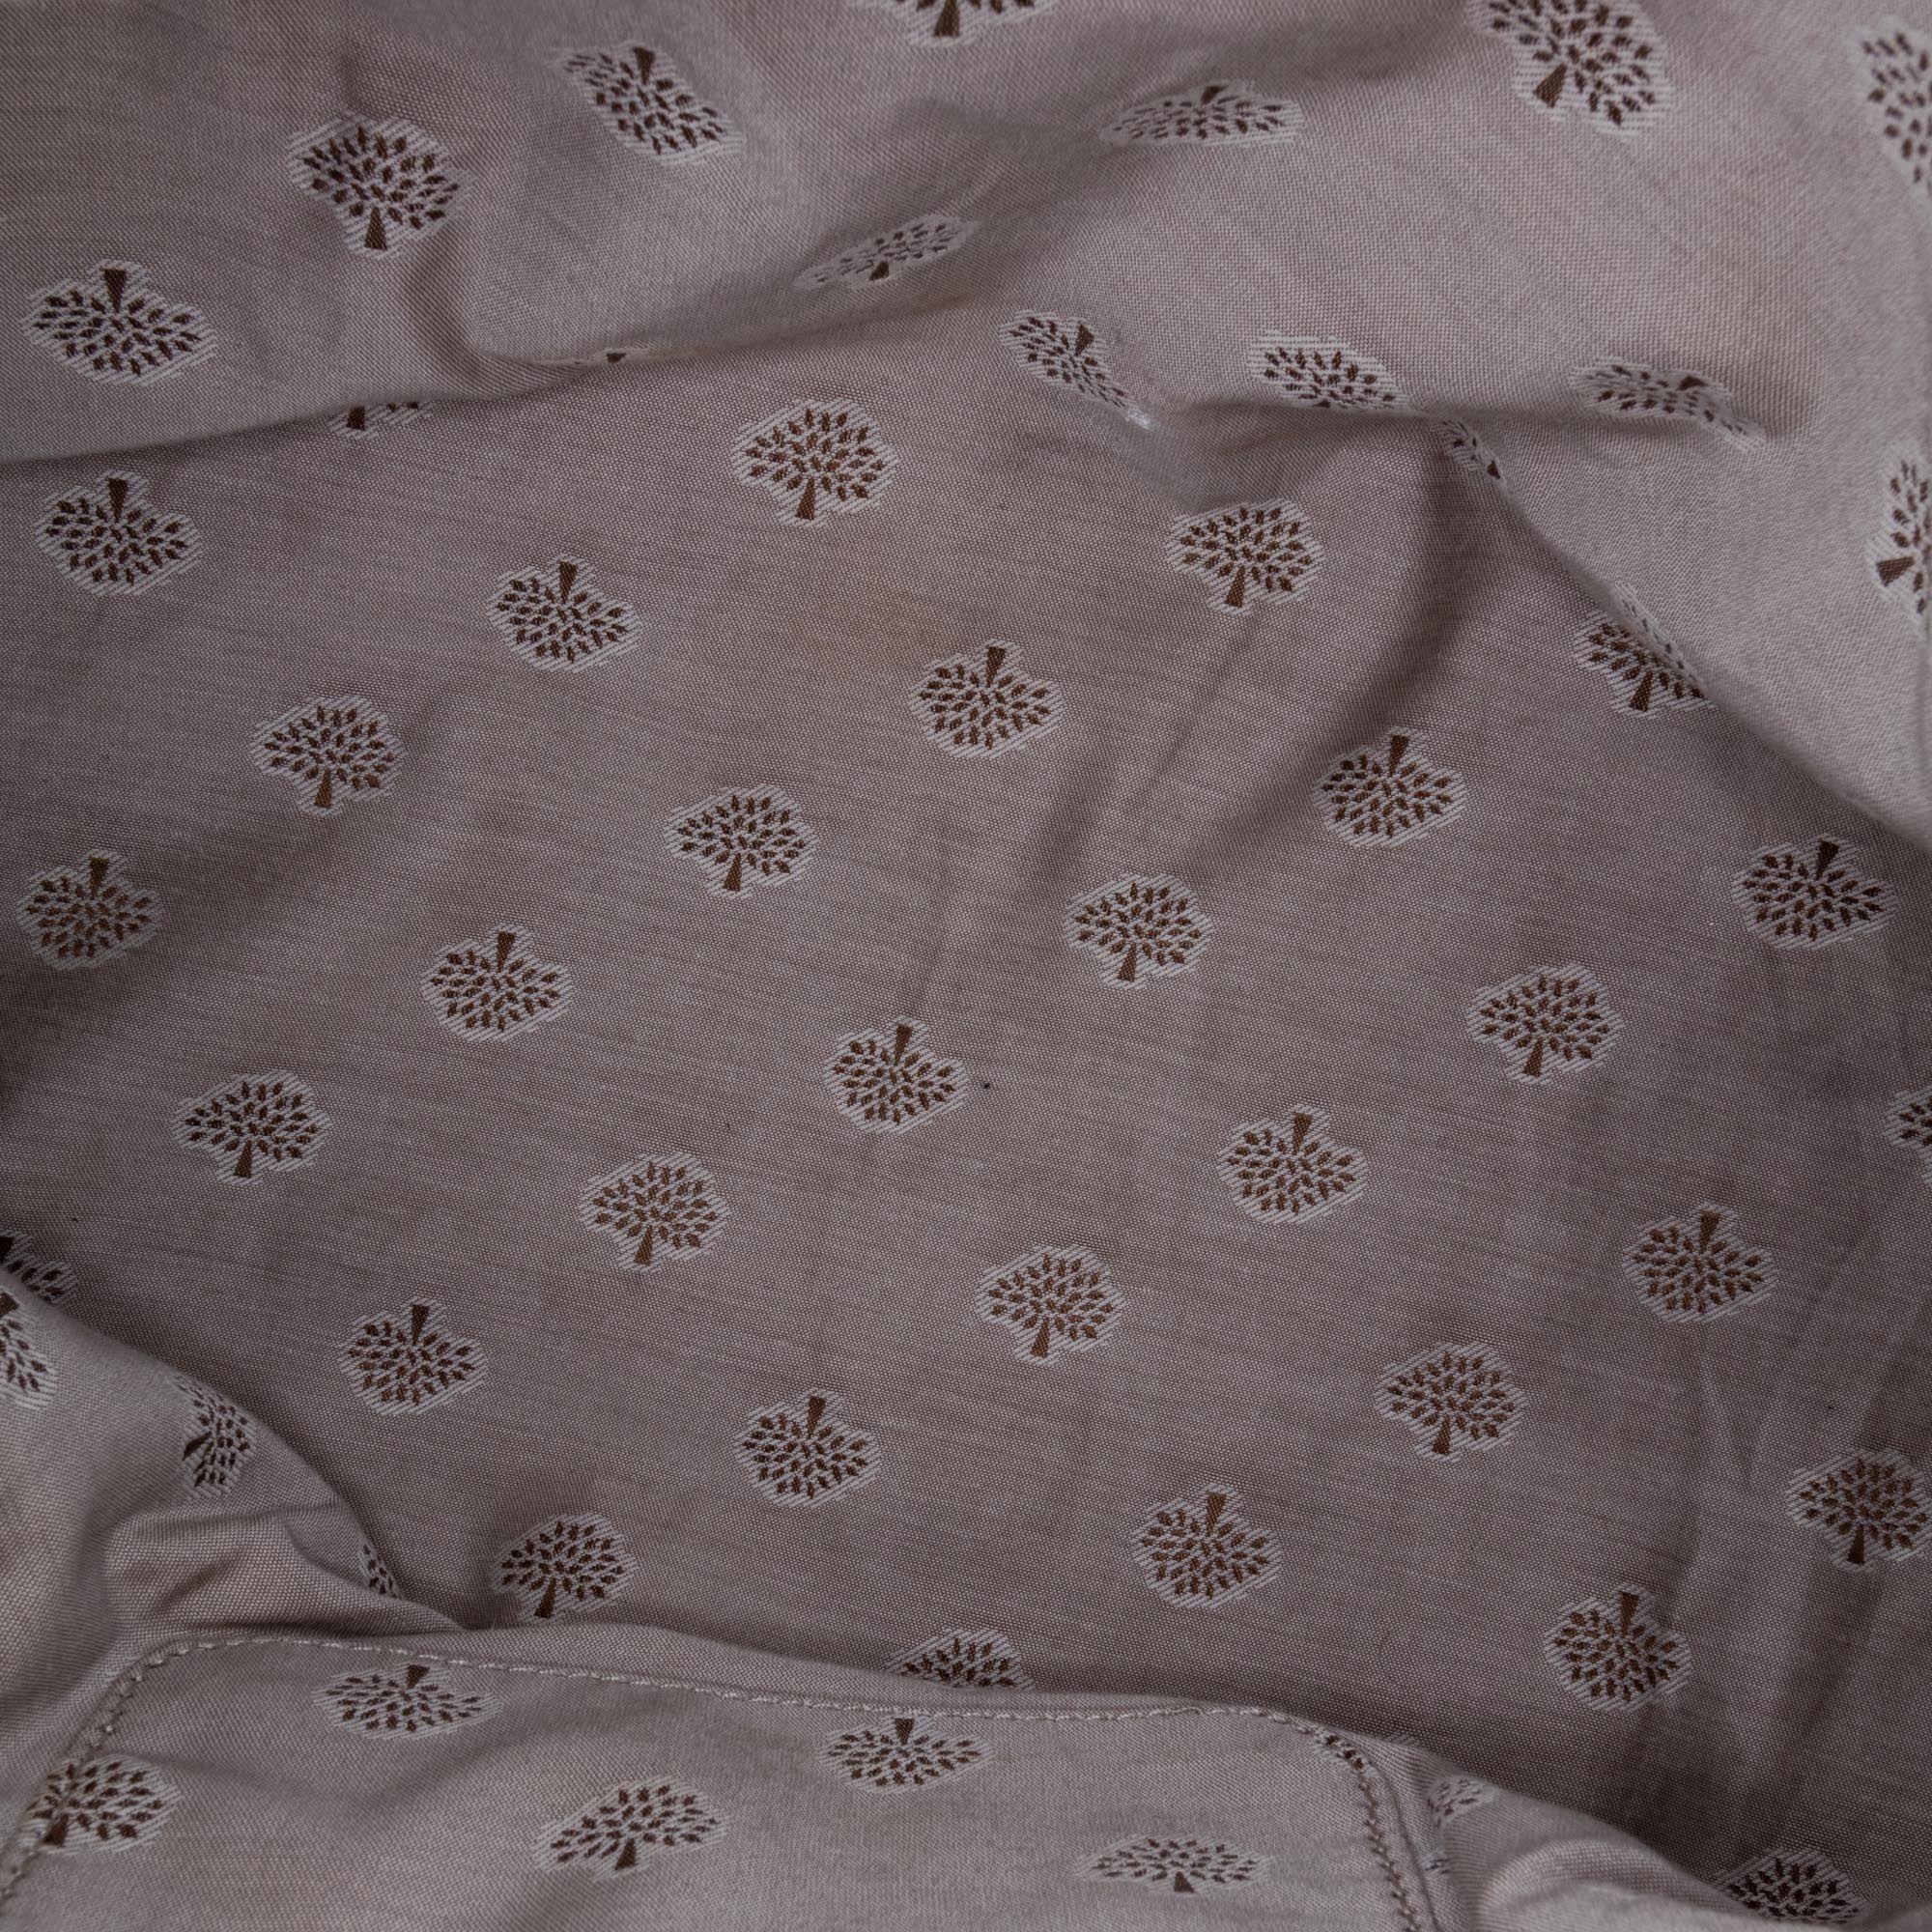 Vintage Mulberry Leather Alexa Satchel White